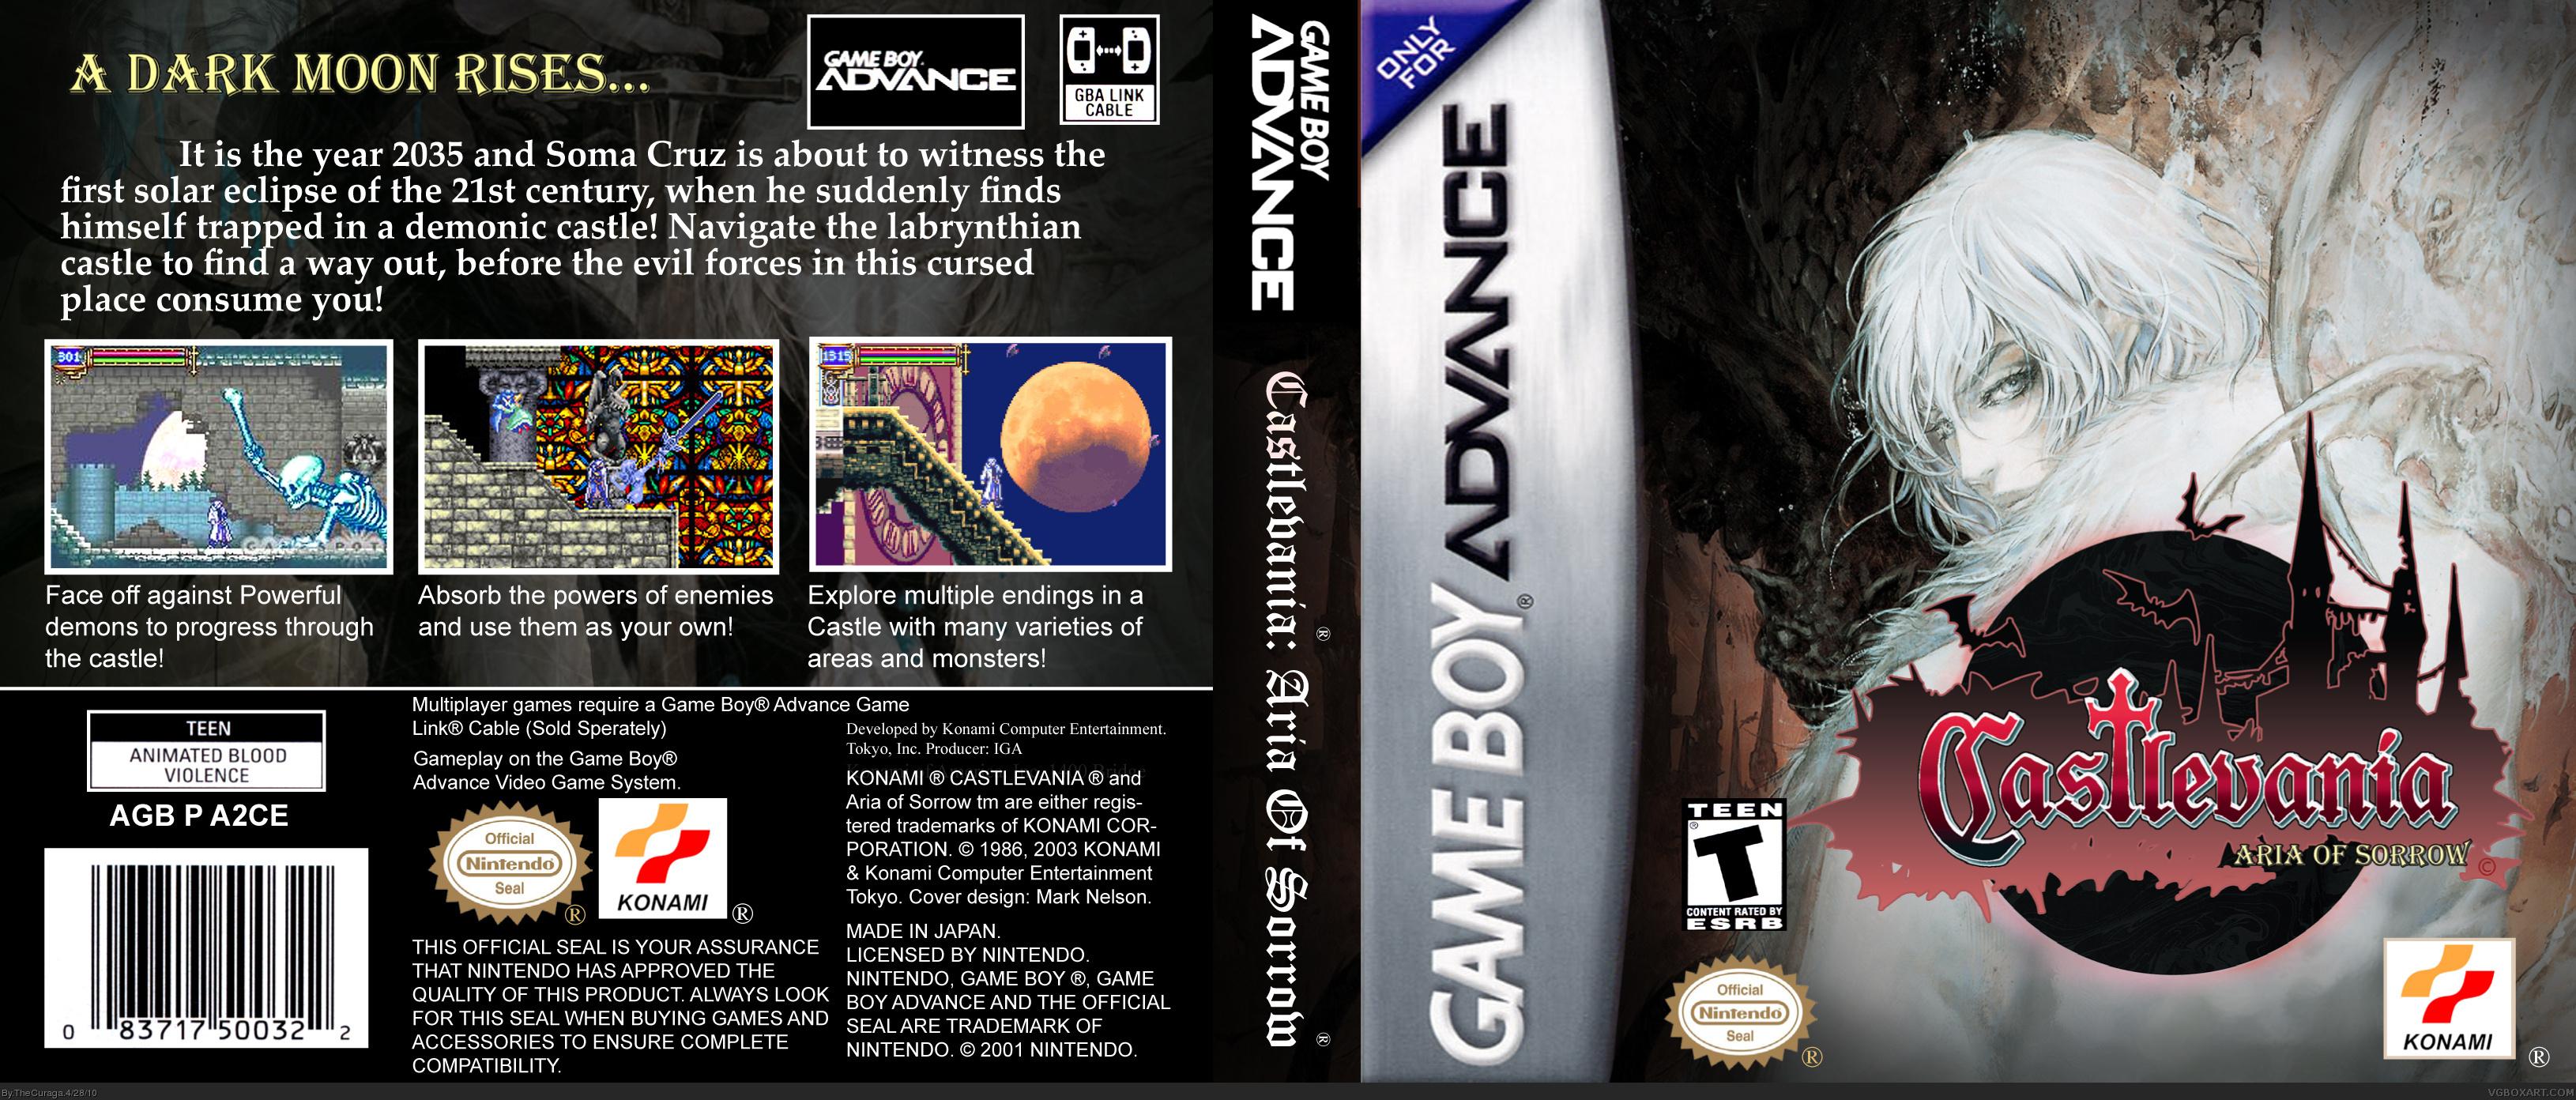 Castlevania Aria Of Sorrow Game Boy Advance Box Art Cover